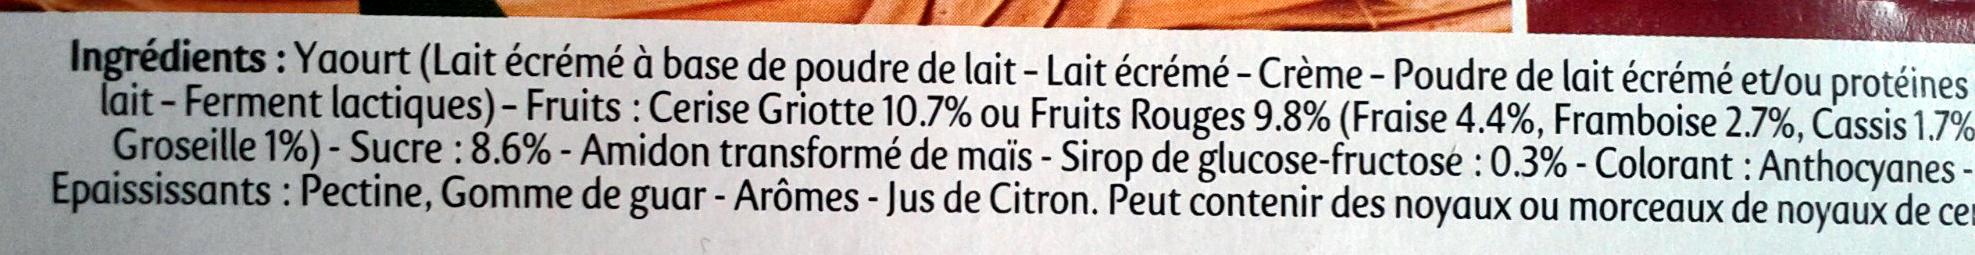 Panier de Yoplait Cerise, Fruits rouges - Ingrediënten